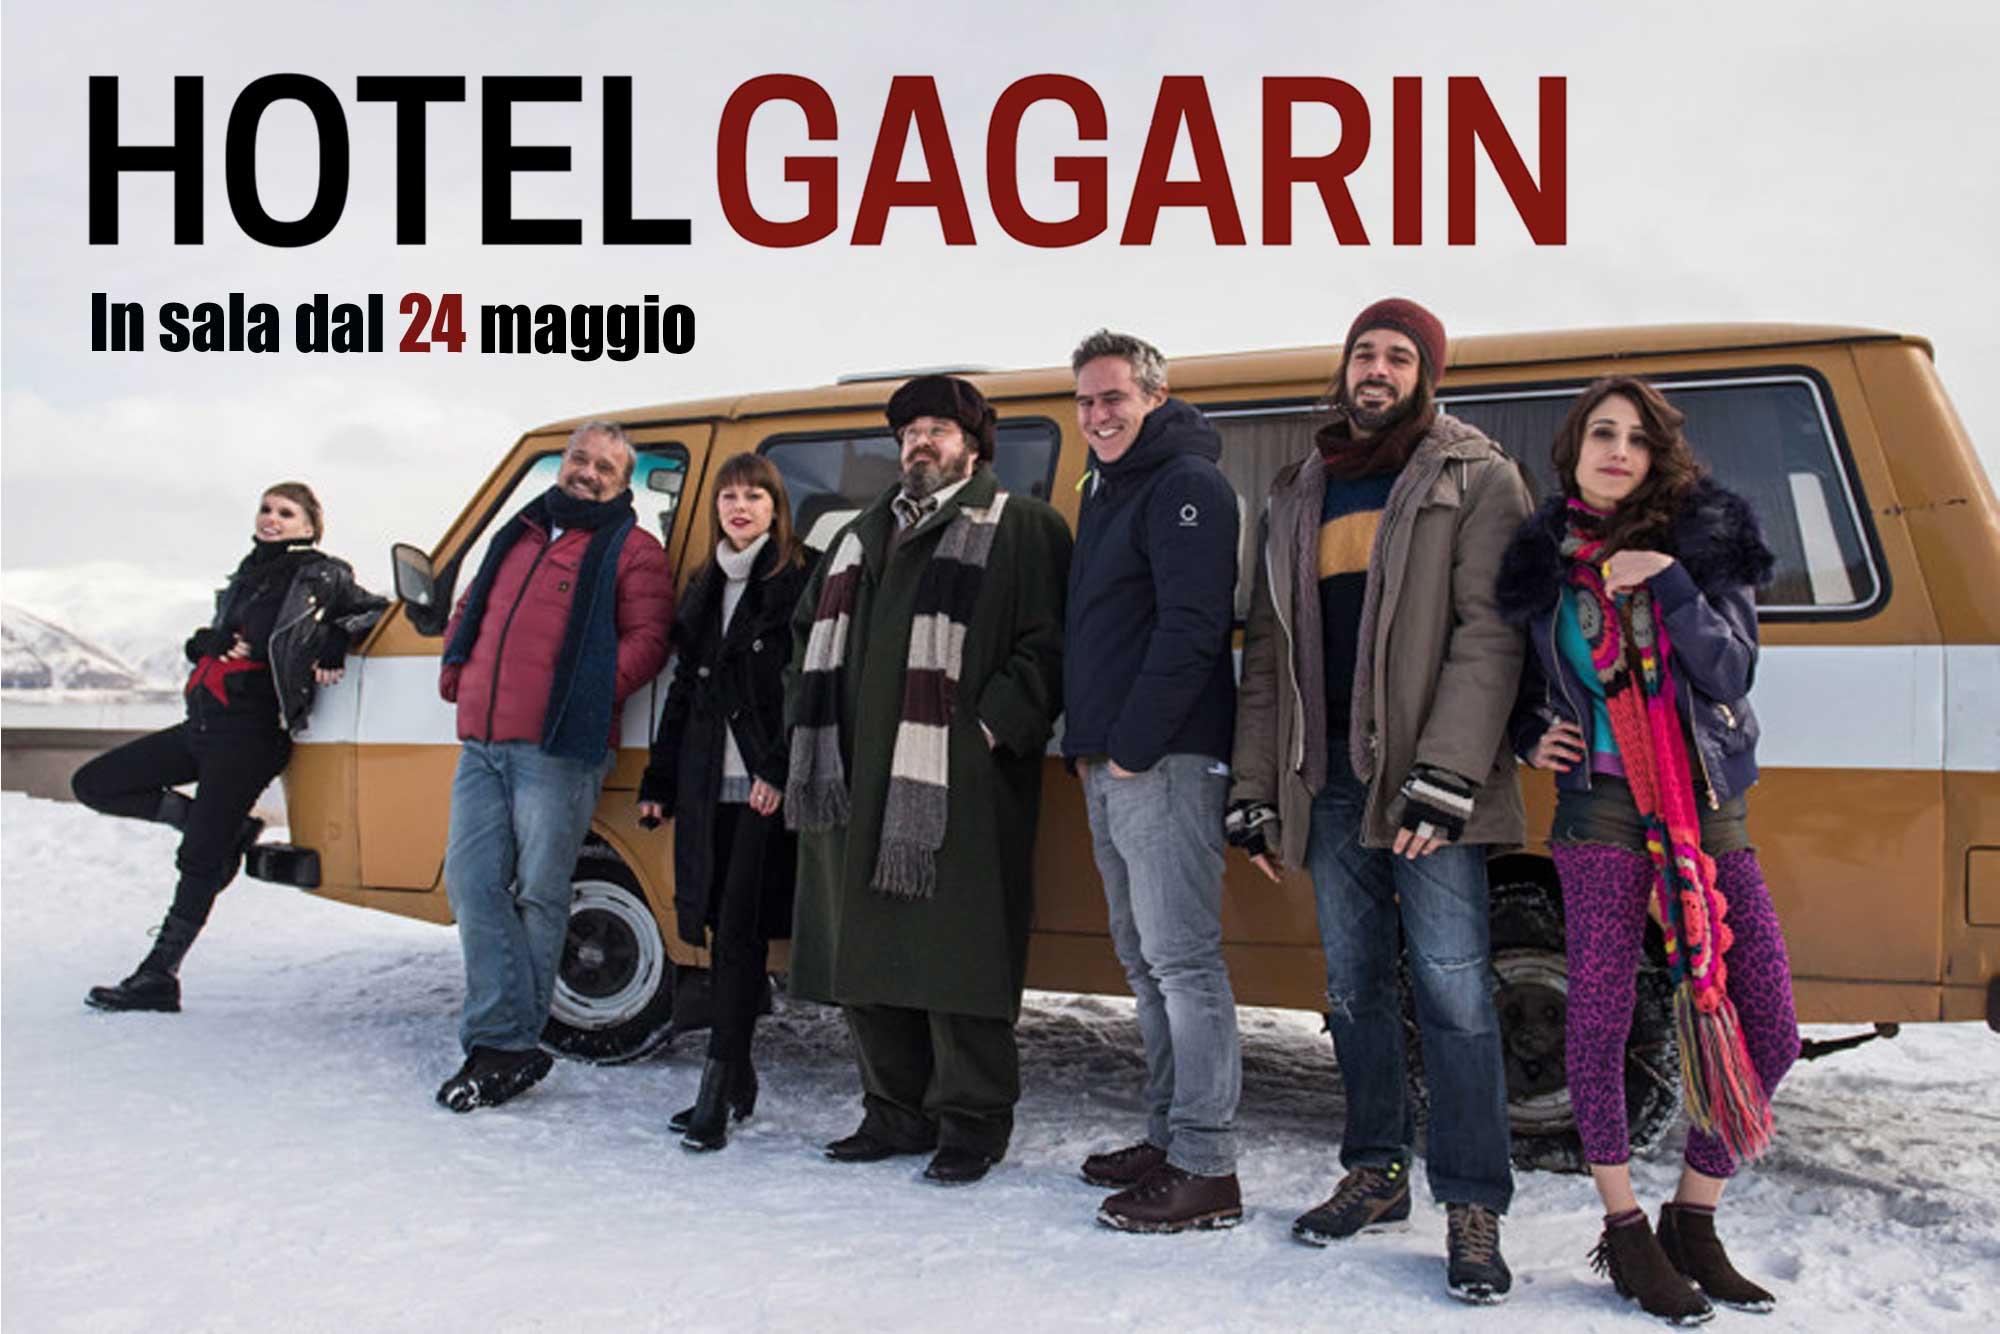 Hotel_Gagarin_slide-1